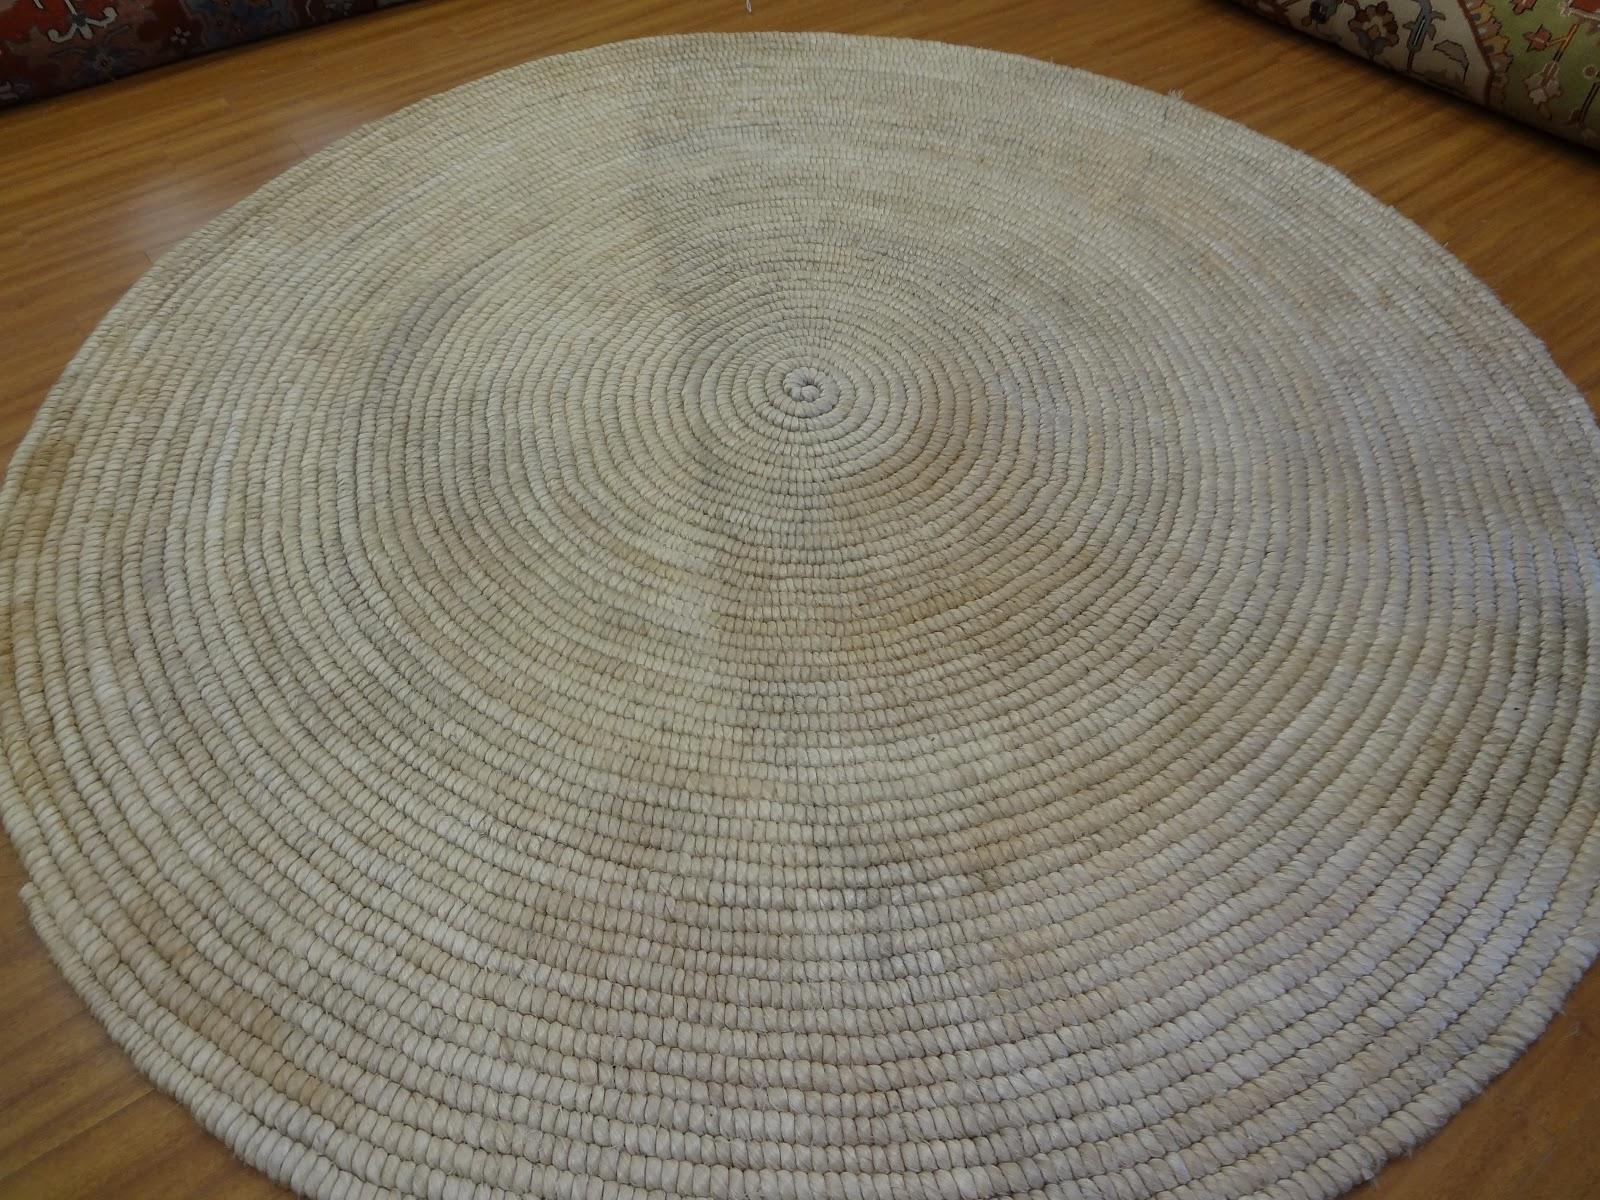 Sisal Seagr Hemp And Jute Rug Carpet Cleaning